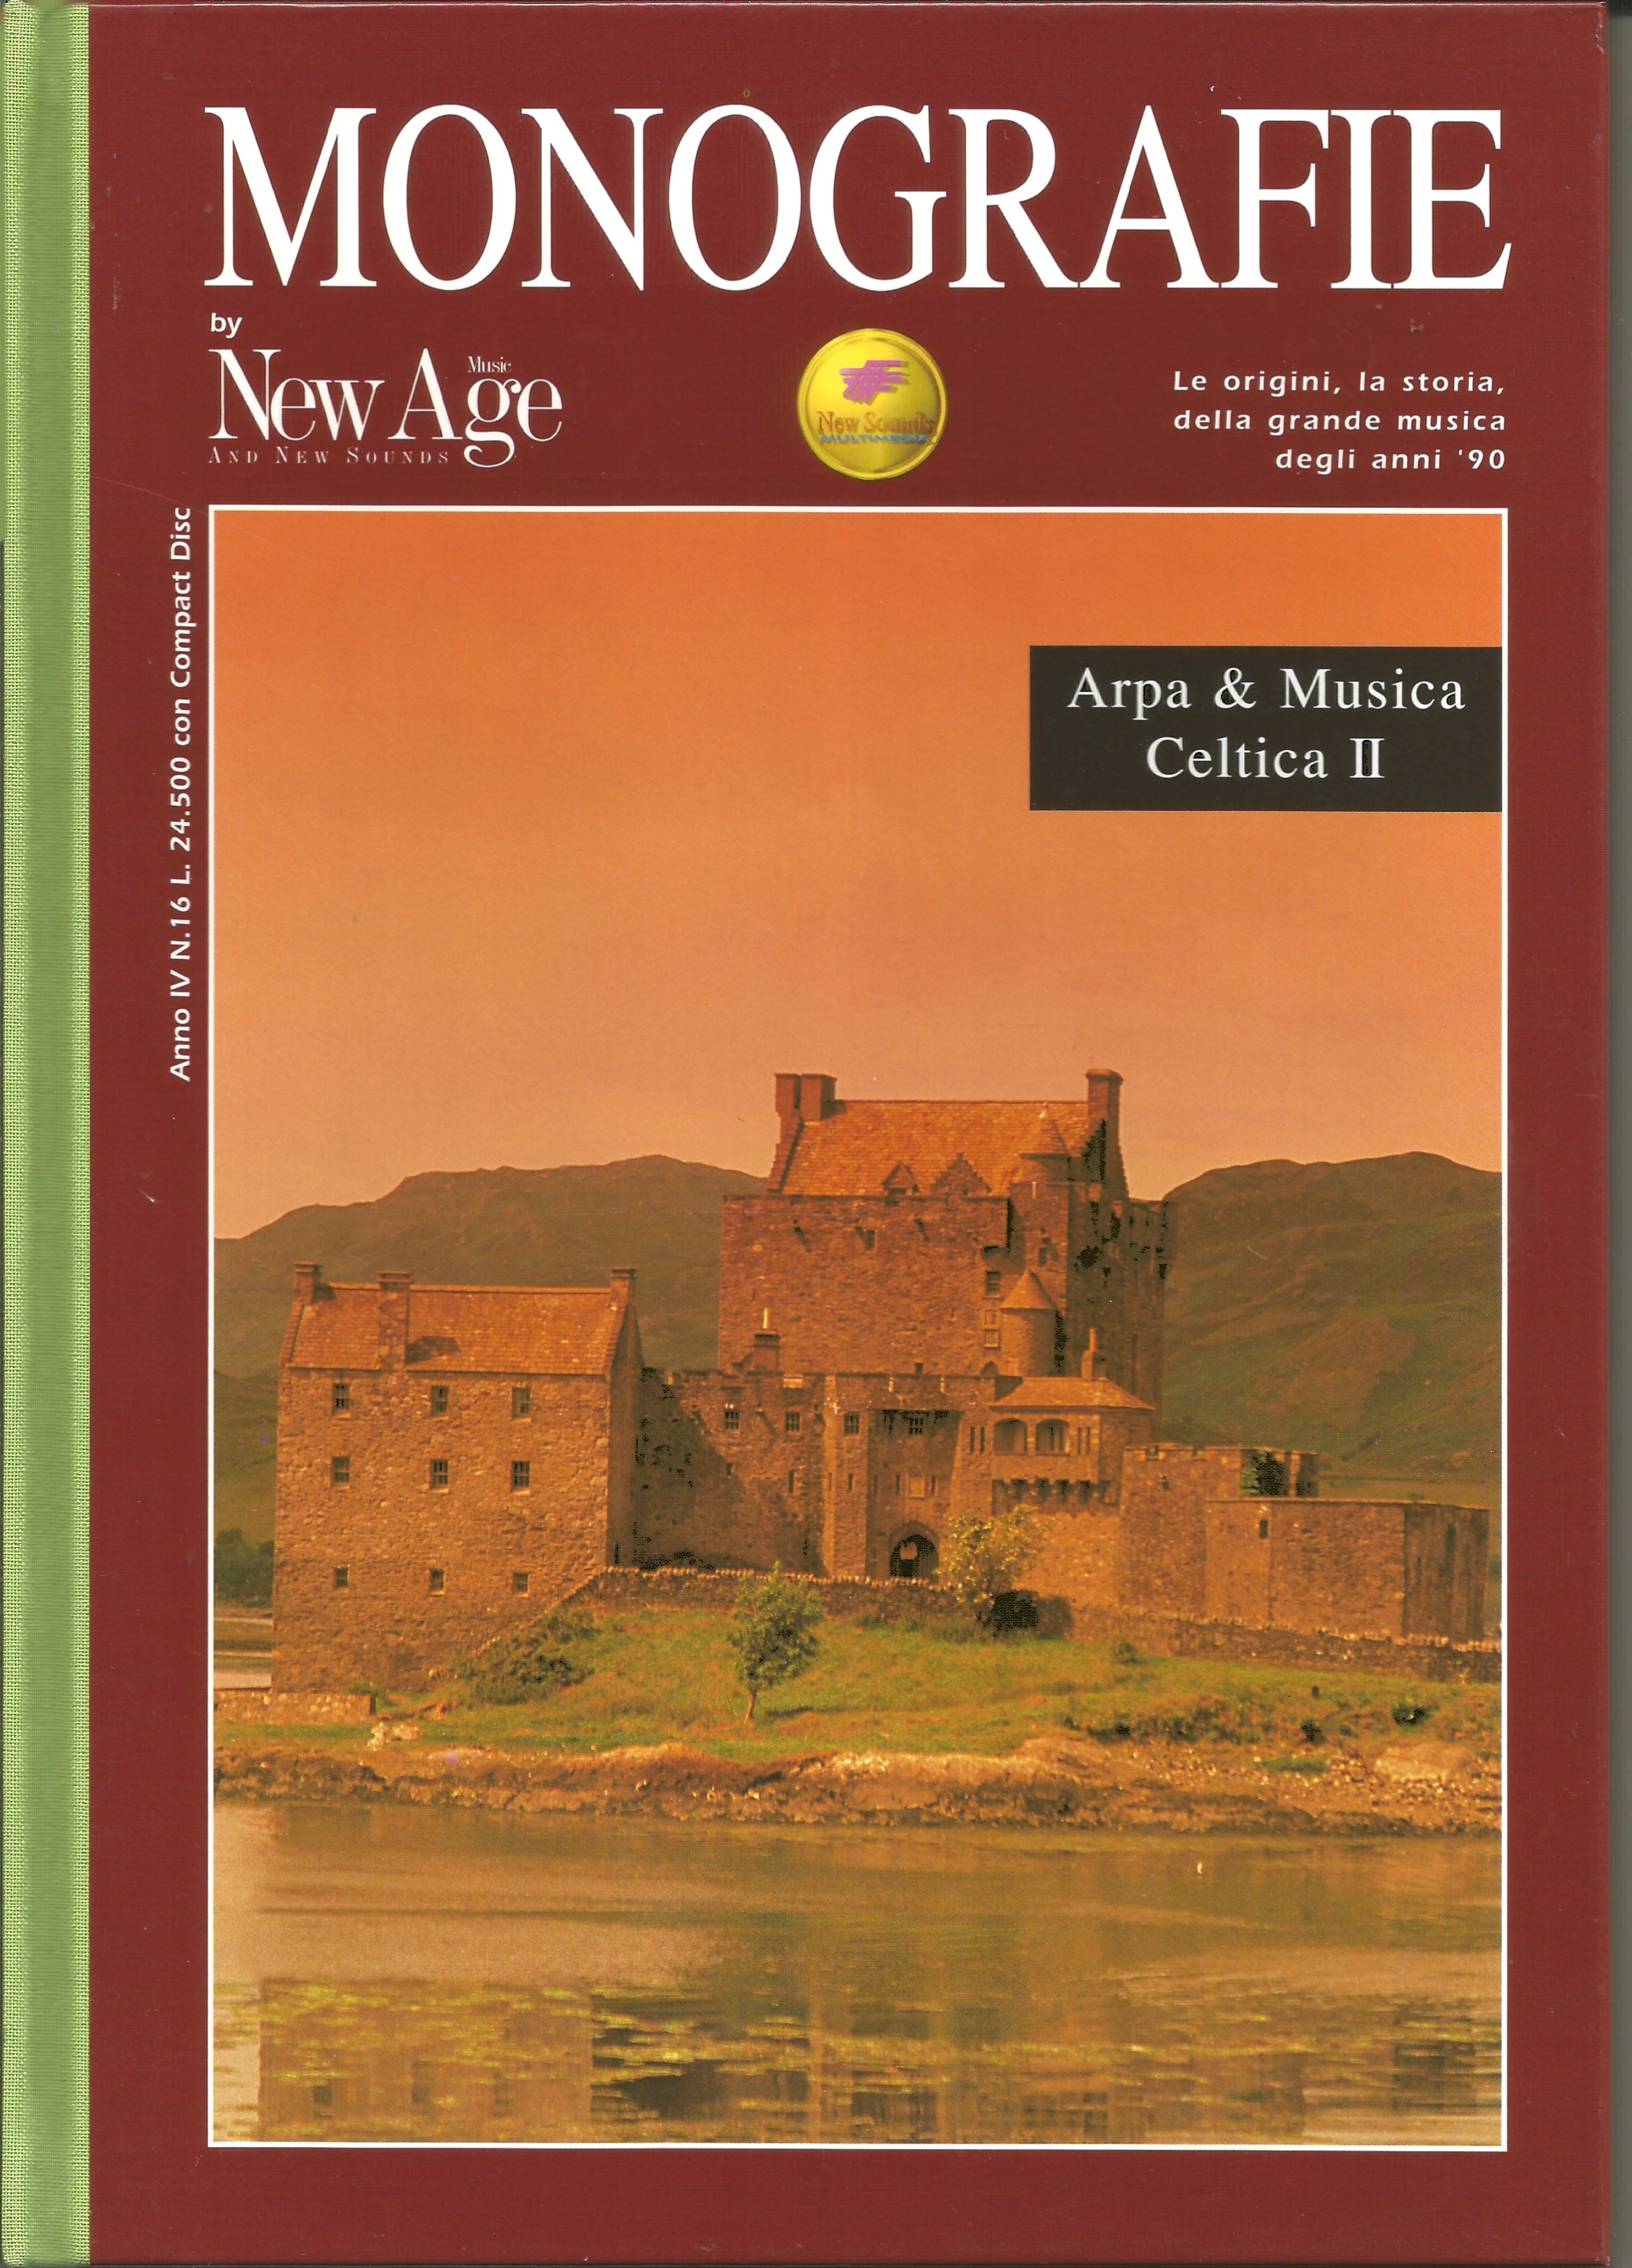 Arpa & Musica Celtica II